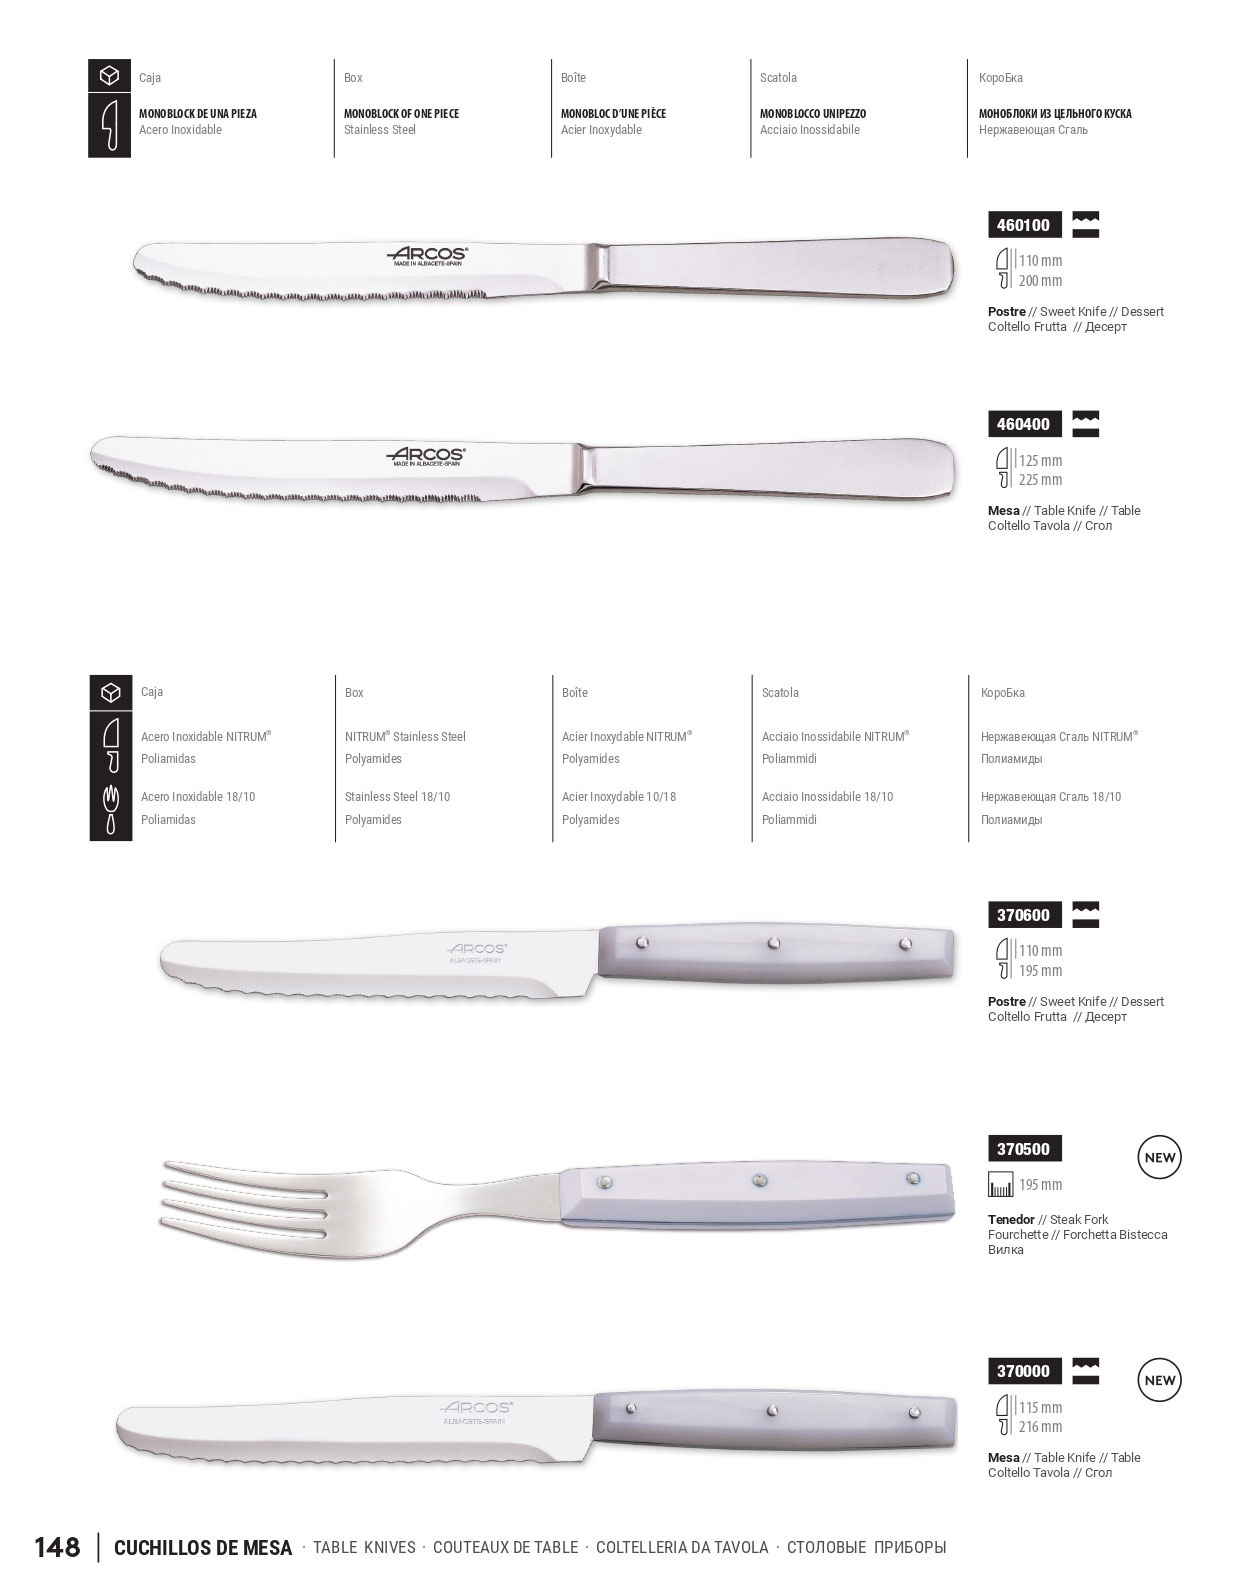 805109 cuchillos de mesa arcos menaje cocina cubiertos mesa cuchilleria albacete - Fundas para cuchillos de cocina ...